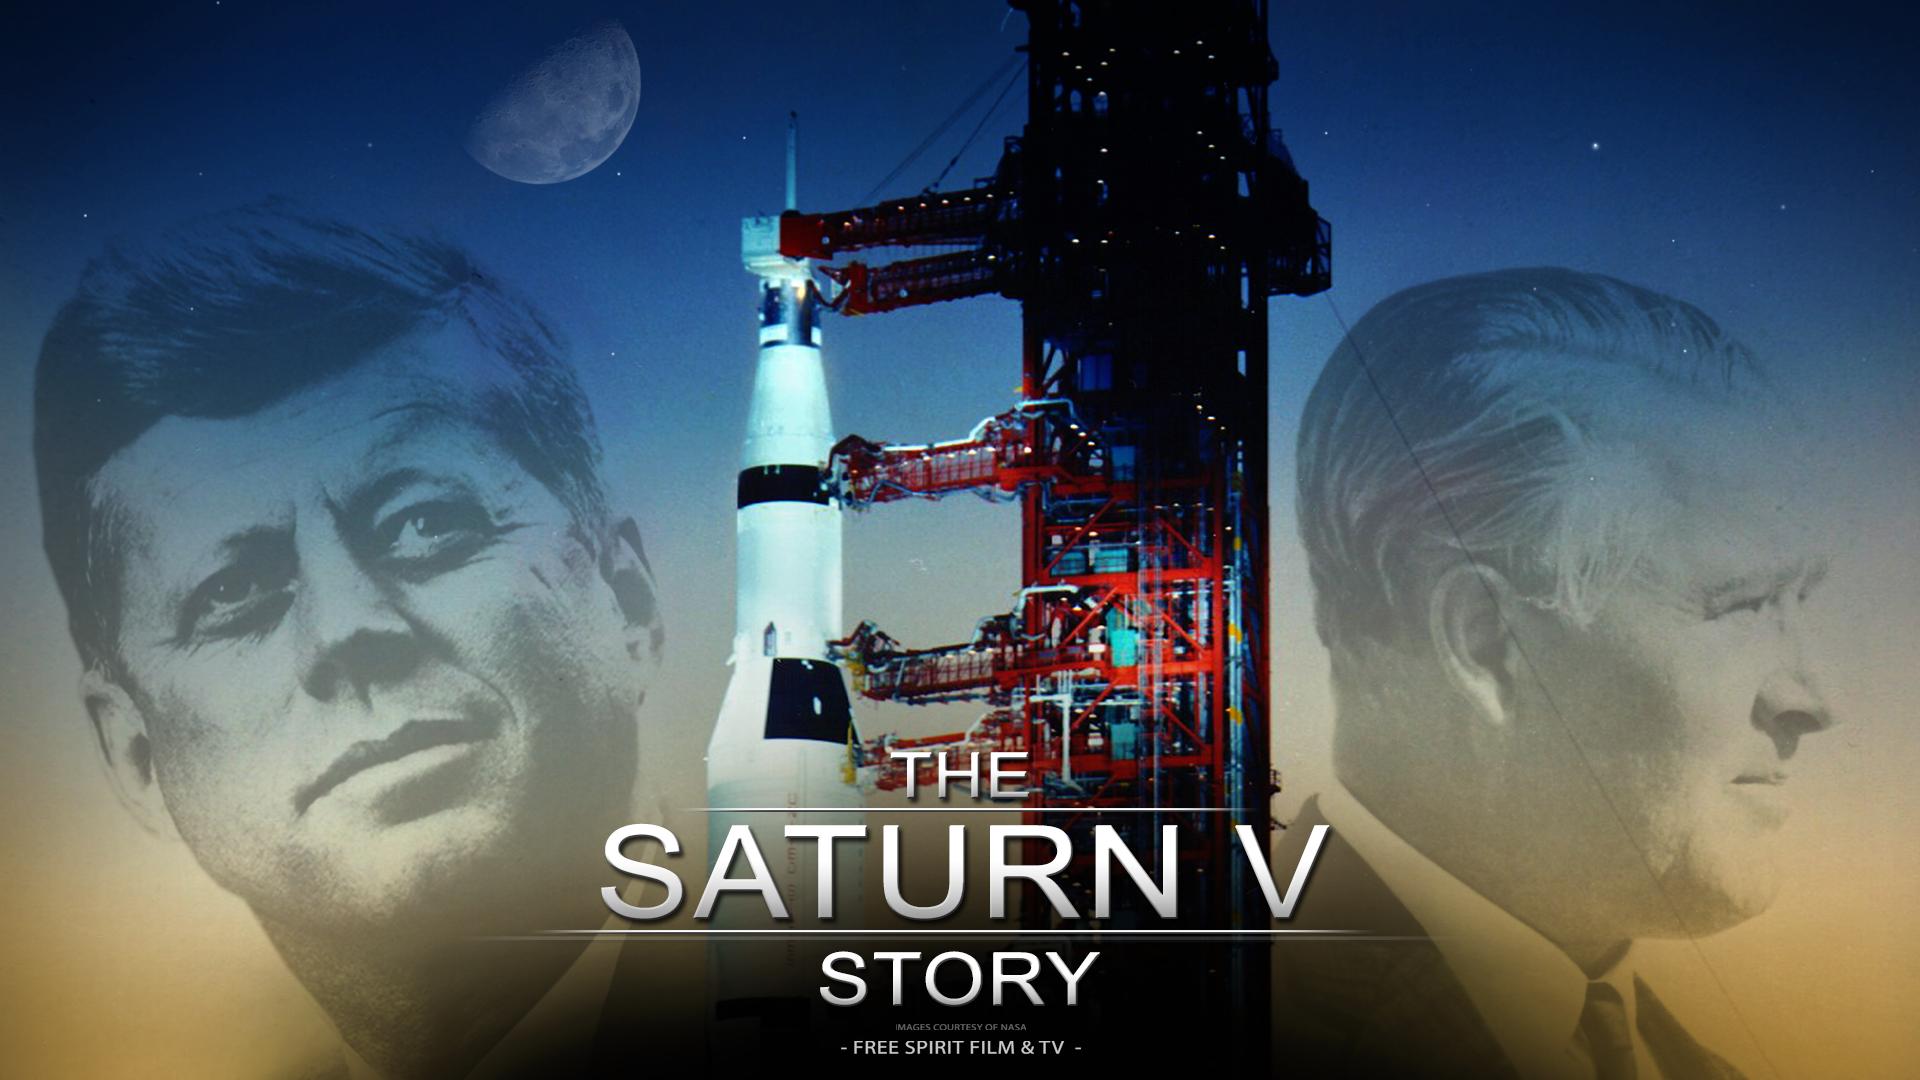 The Saturn V Story